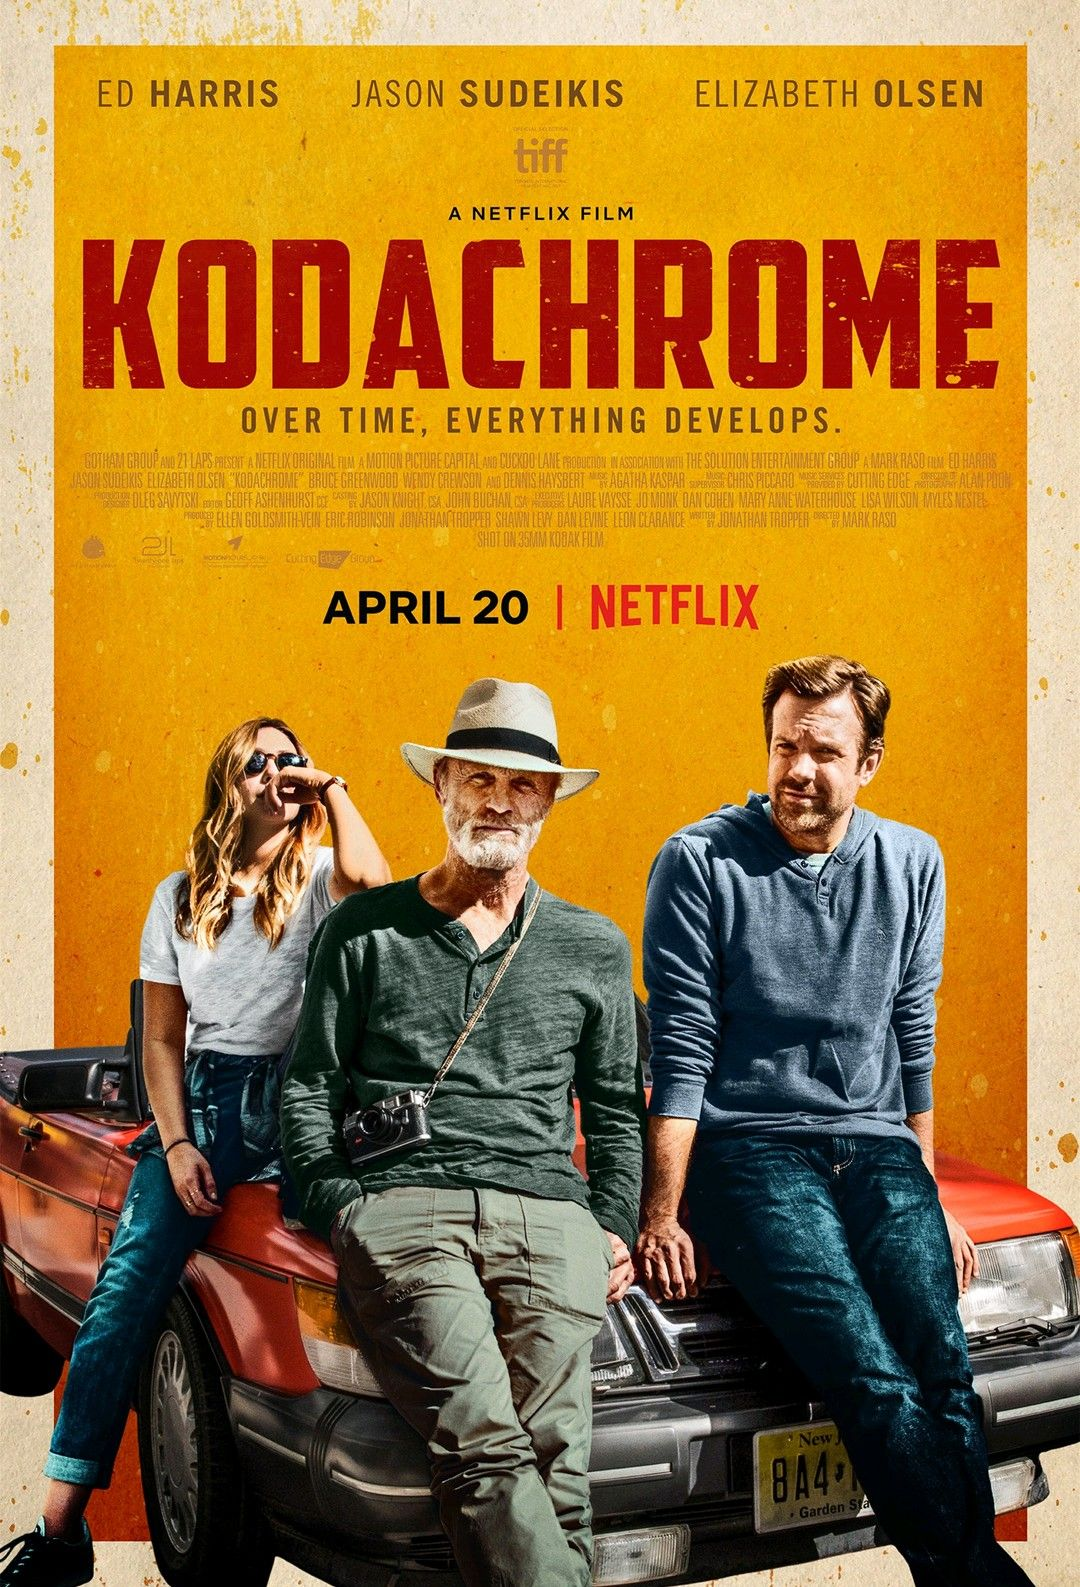 Kodachrome, Netflix, 2018. Novo filme da netflix, Filmes